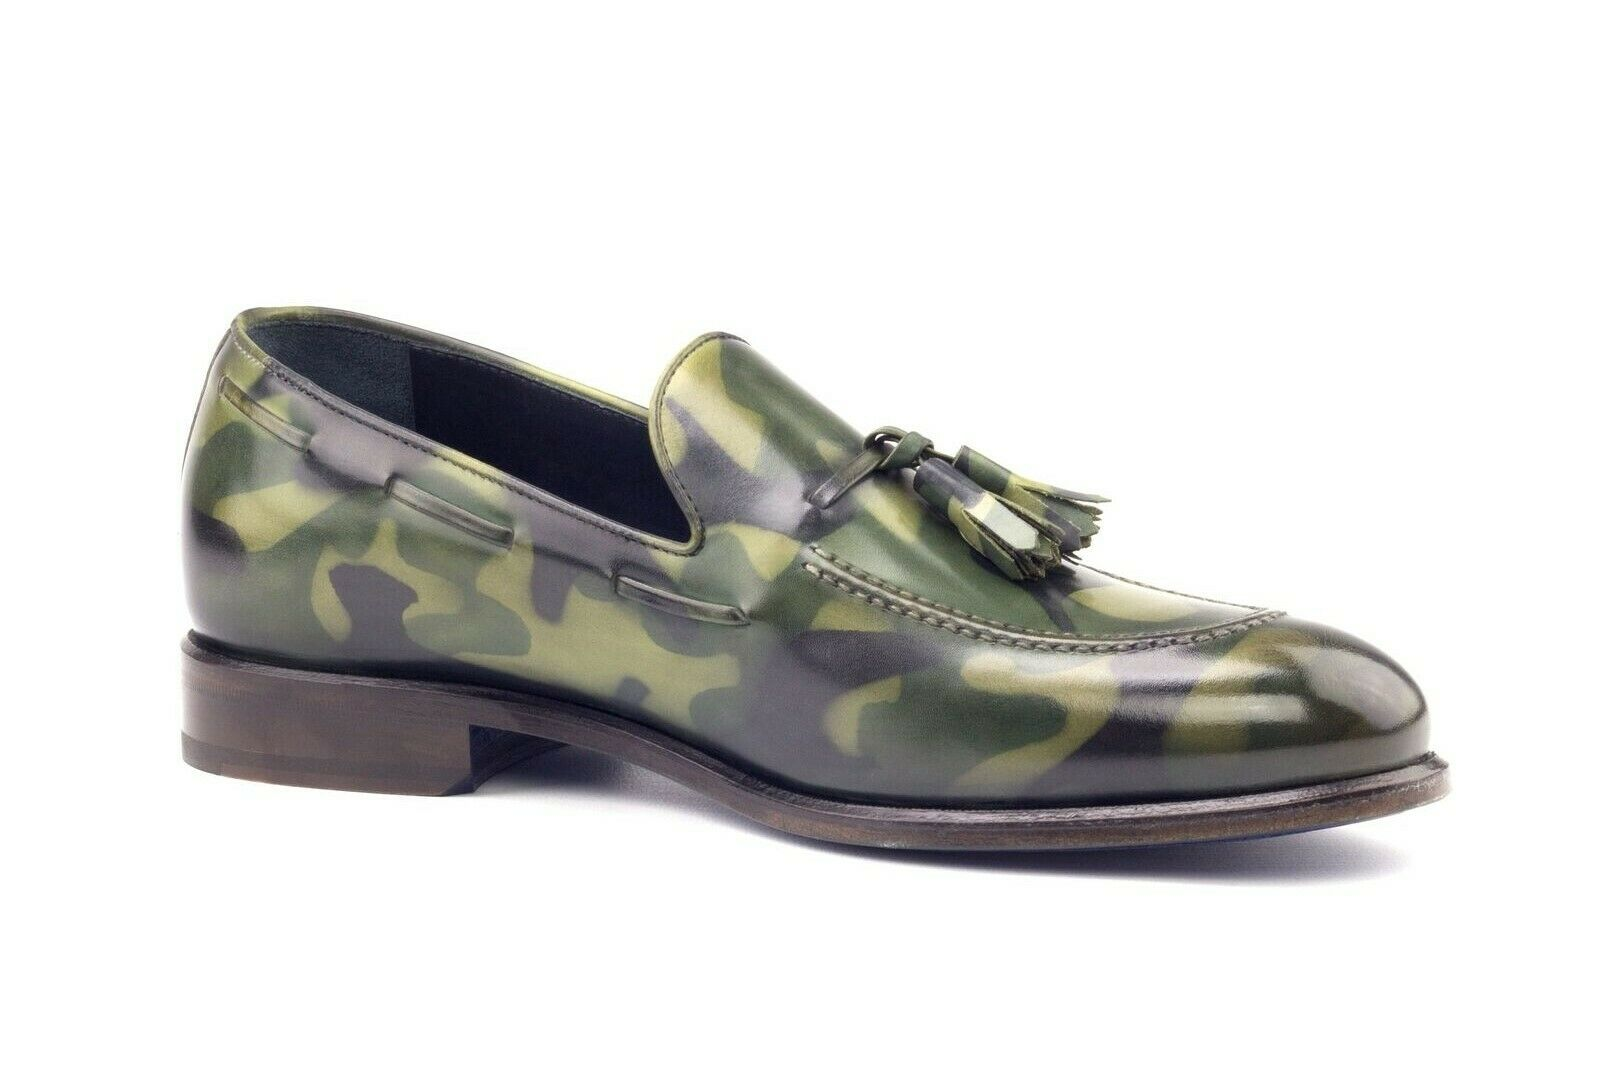 Handgjorda mattor av manligt kamouflage läder loafers egna läderskor